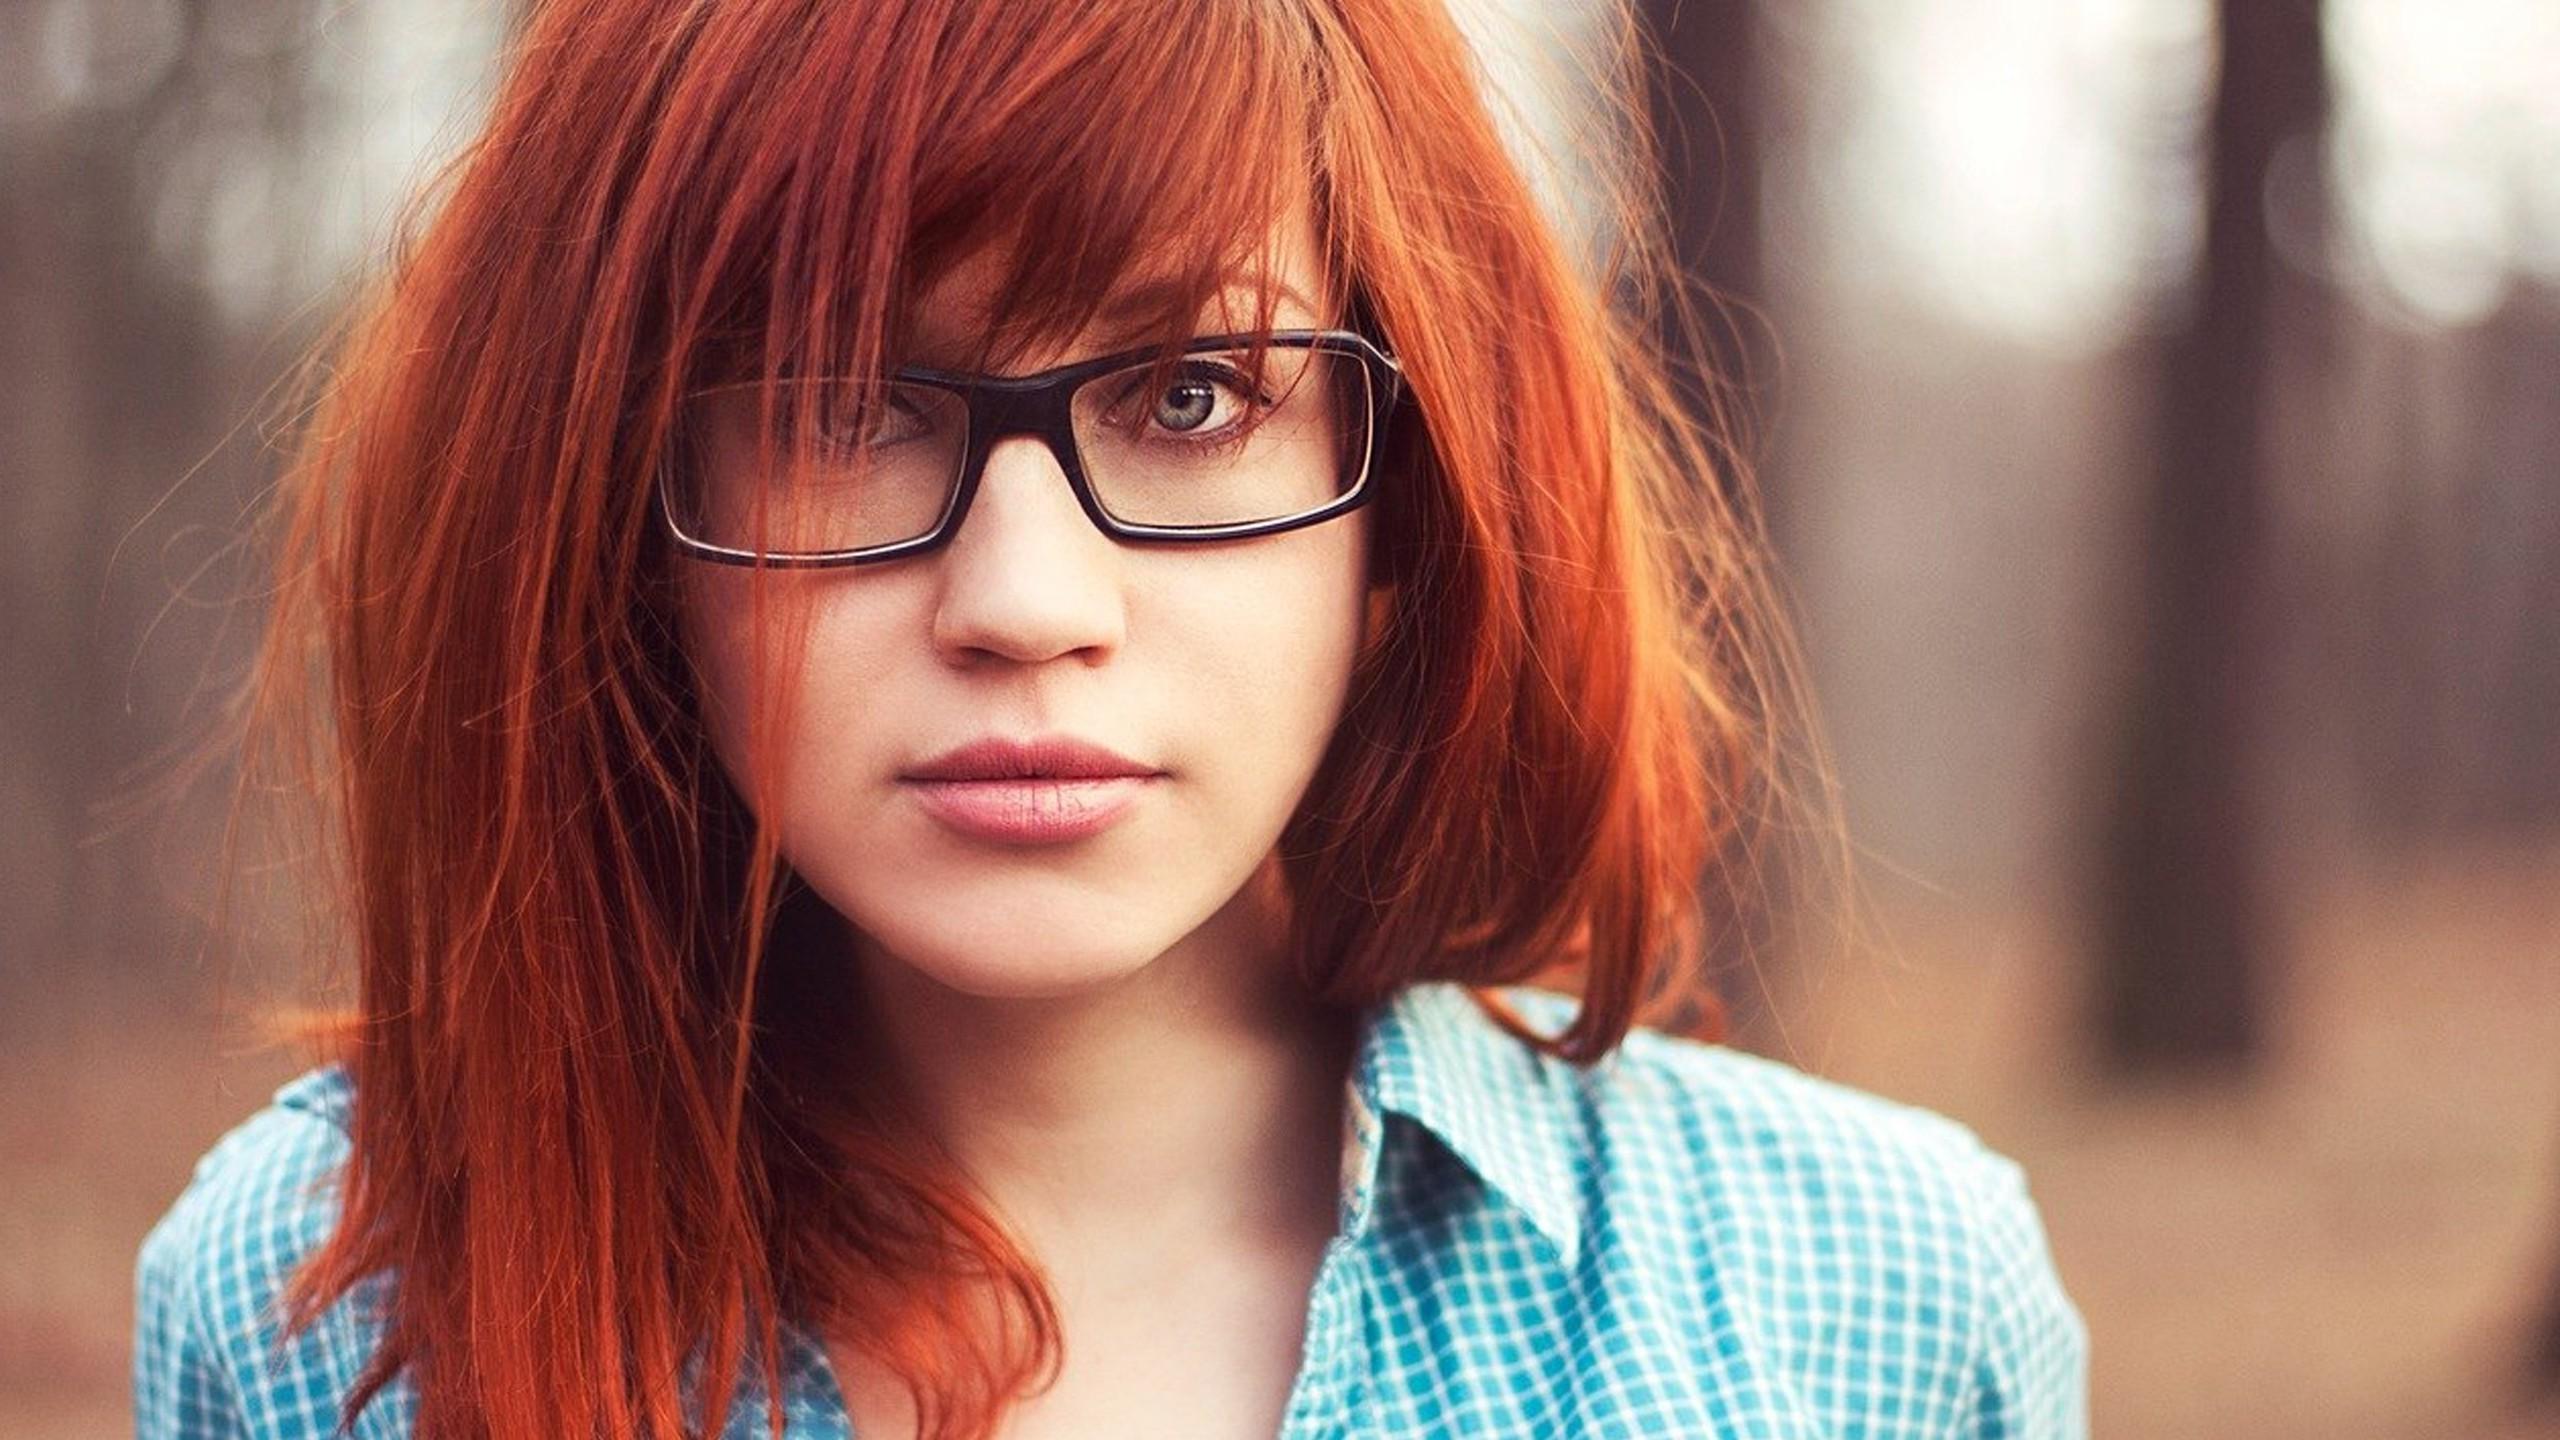 Damen Frisuren Rote Haare Yskgjt Com